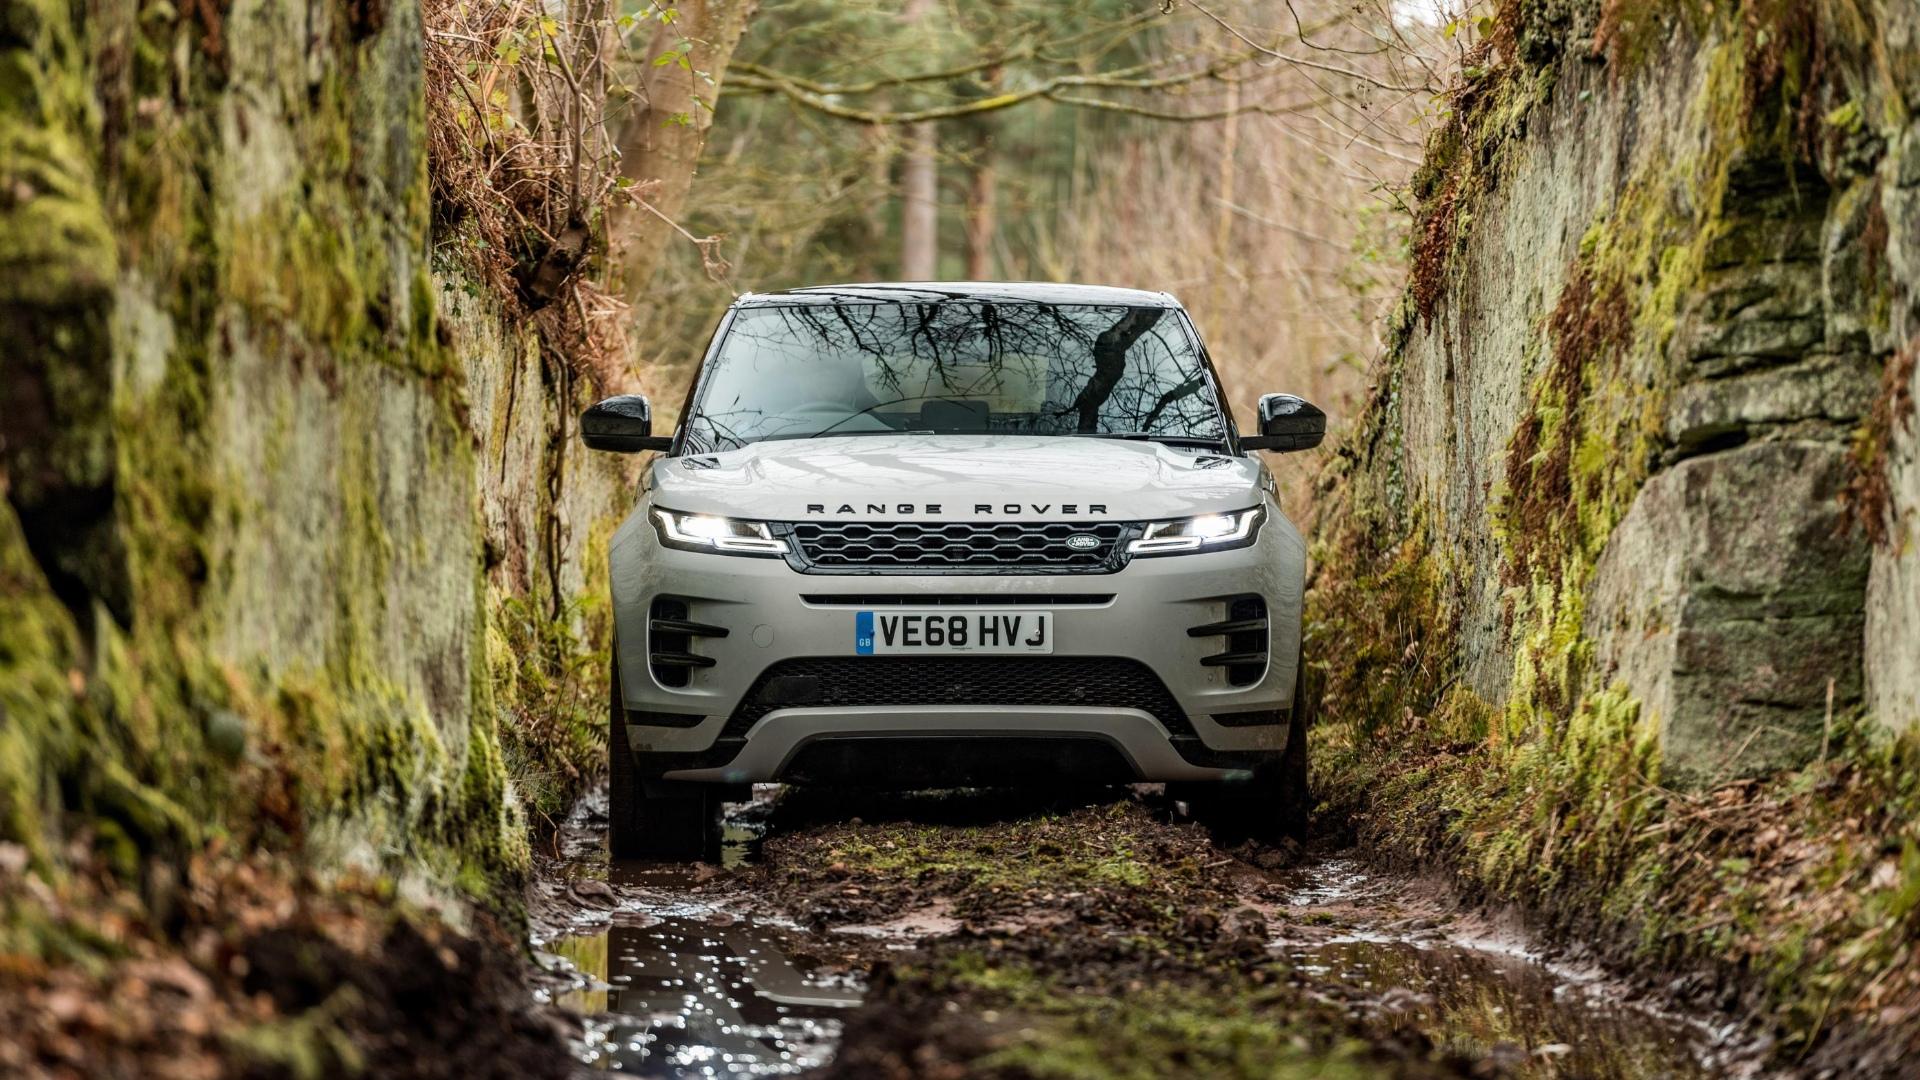 Range Rover emissions